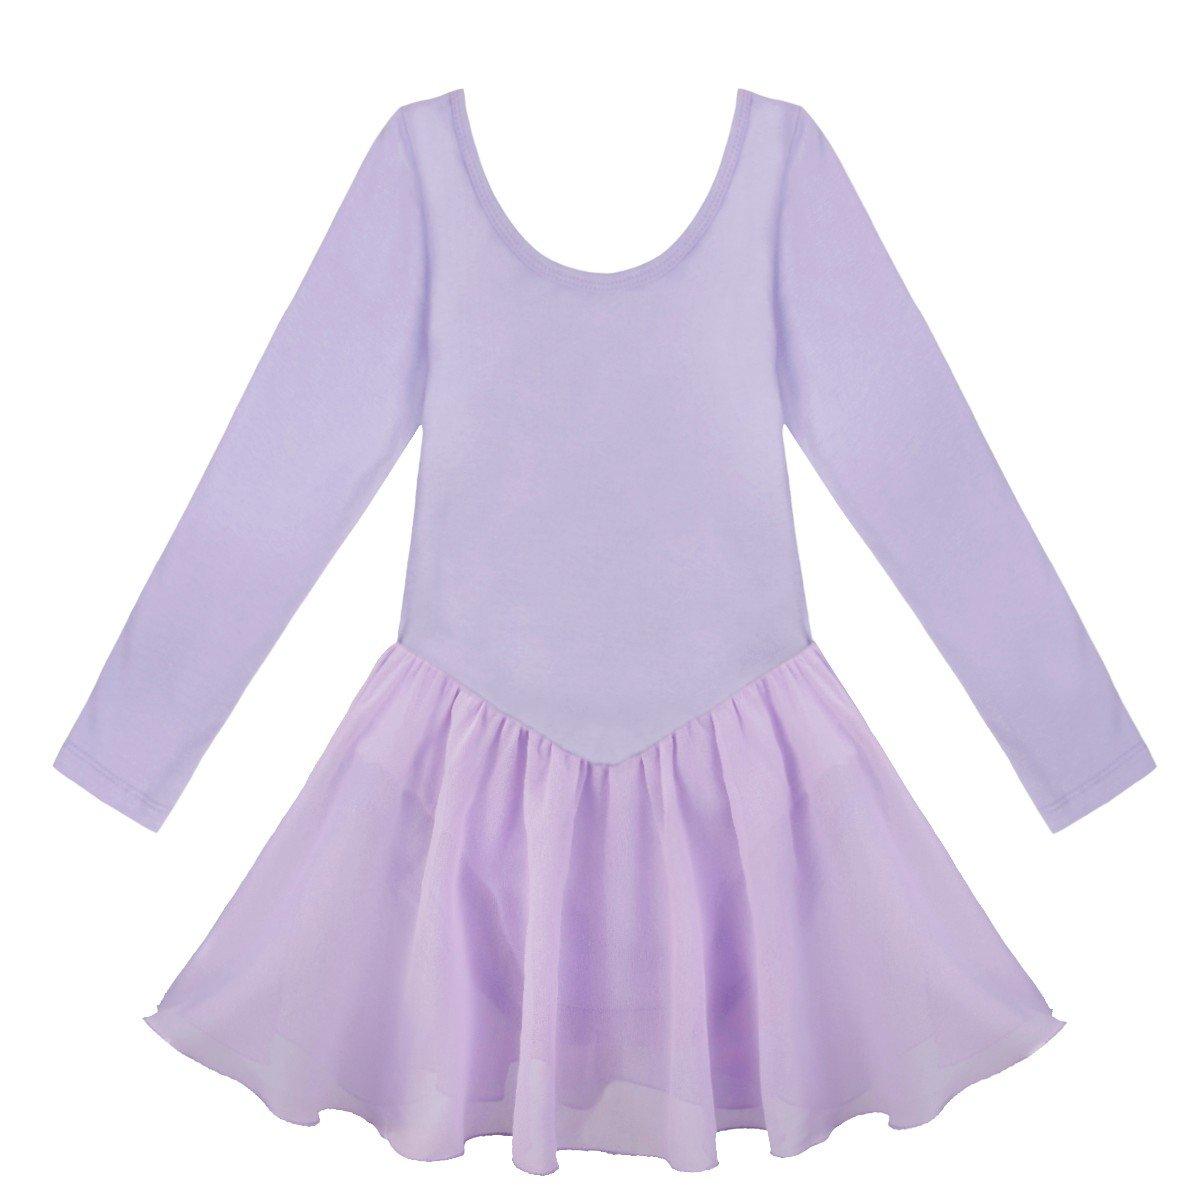 Freebily Little Big Girls Classic Long Sleeve Ballet Dress Gymnastics Leotard with Tutu Skirt